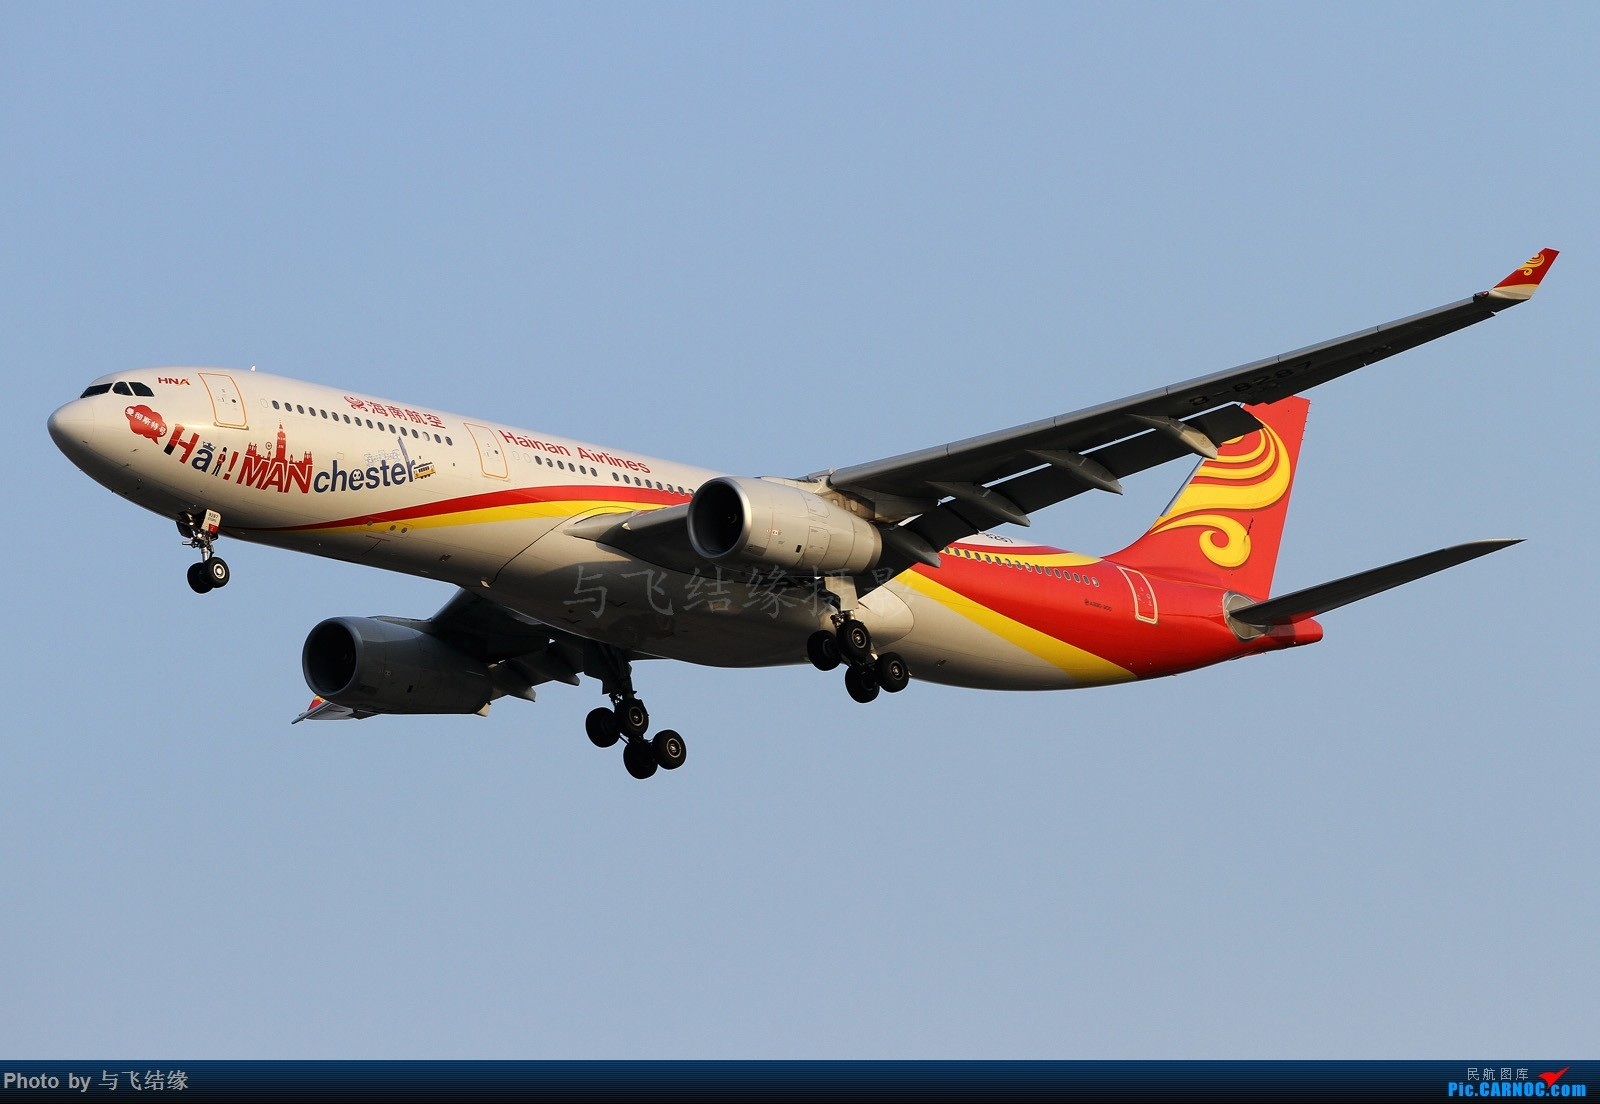 "Re:[原创]""早起的鸟儿有虫吃""祥鹏航空,美佳航空,土库曼斯坦航空等! AIRBUS A330-300 B-8287 中国北京首都国际机场"